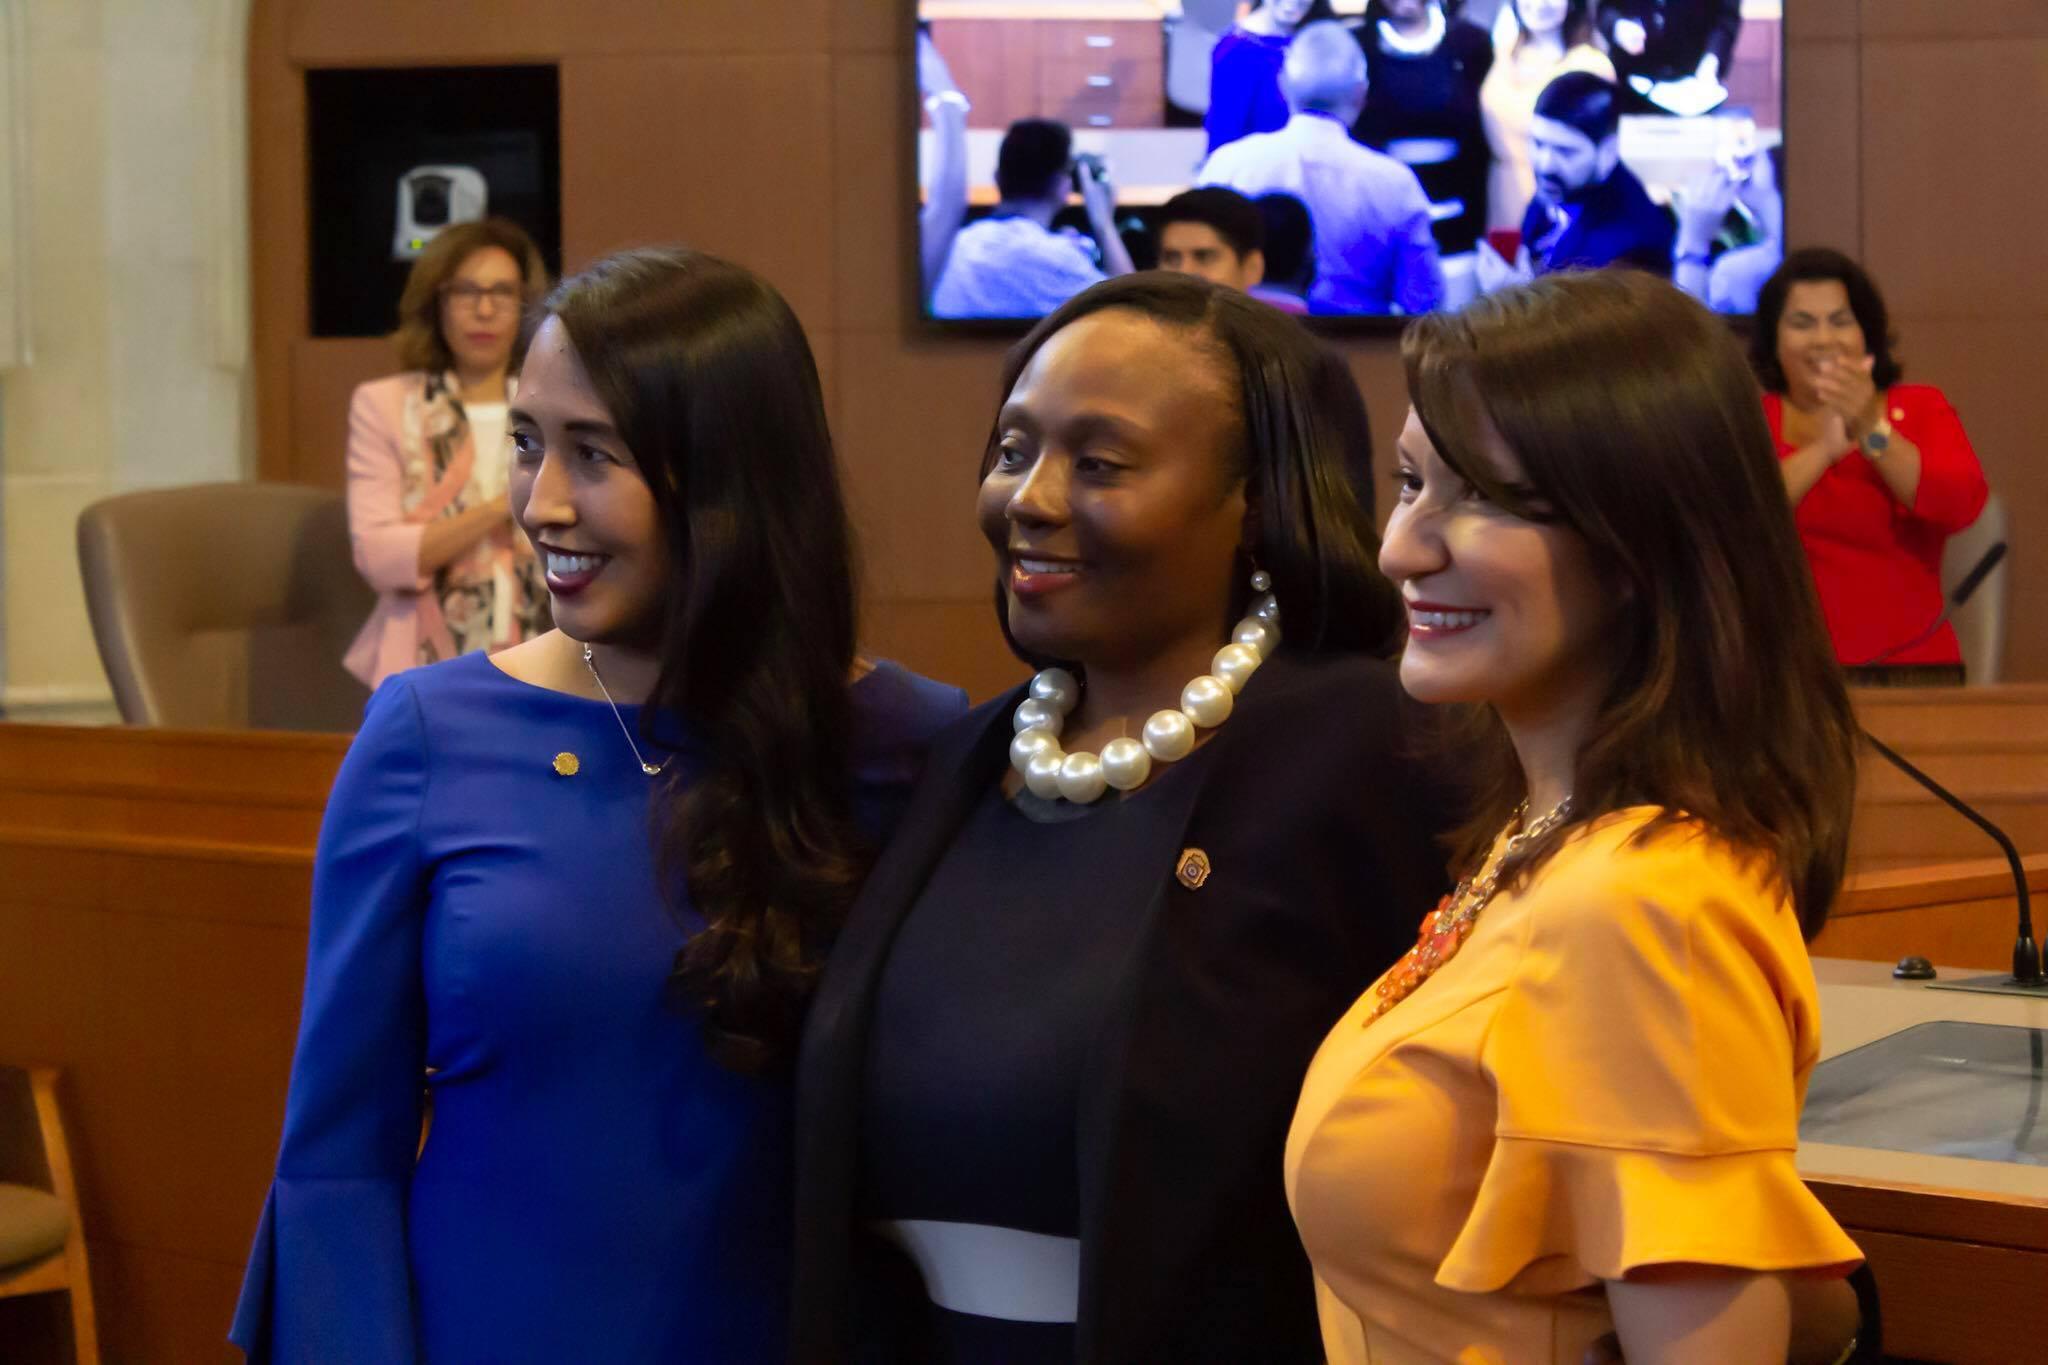 From Left to Right: Melissa Cabello Havrda, Jada Andrews-Sullivan, Dr. Adriana Rocha Garcia. (Photo by  William Timmerman  - Photographer, San Antonio Sentinel)